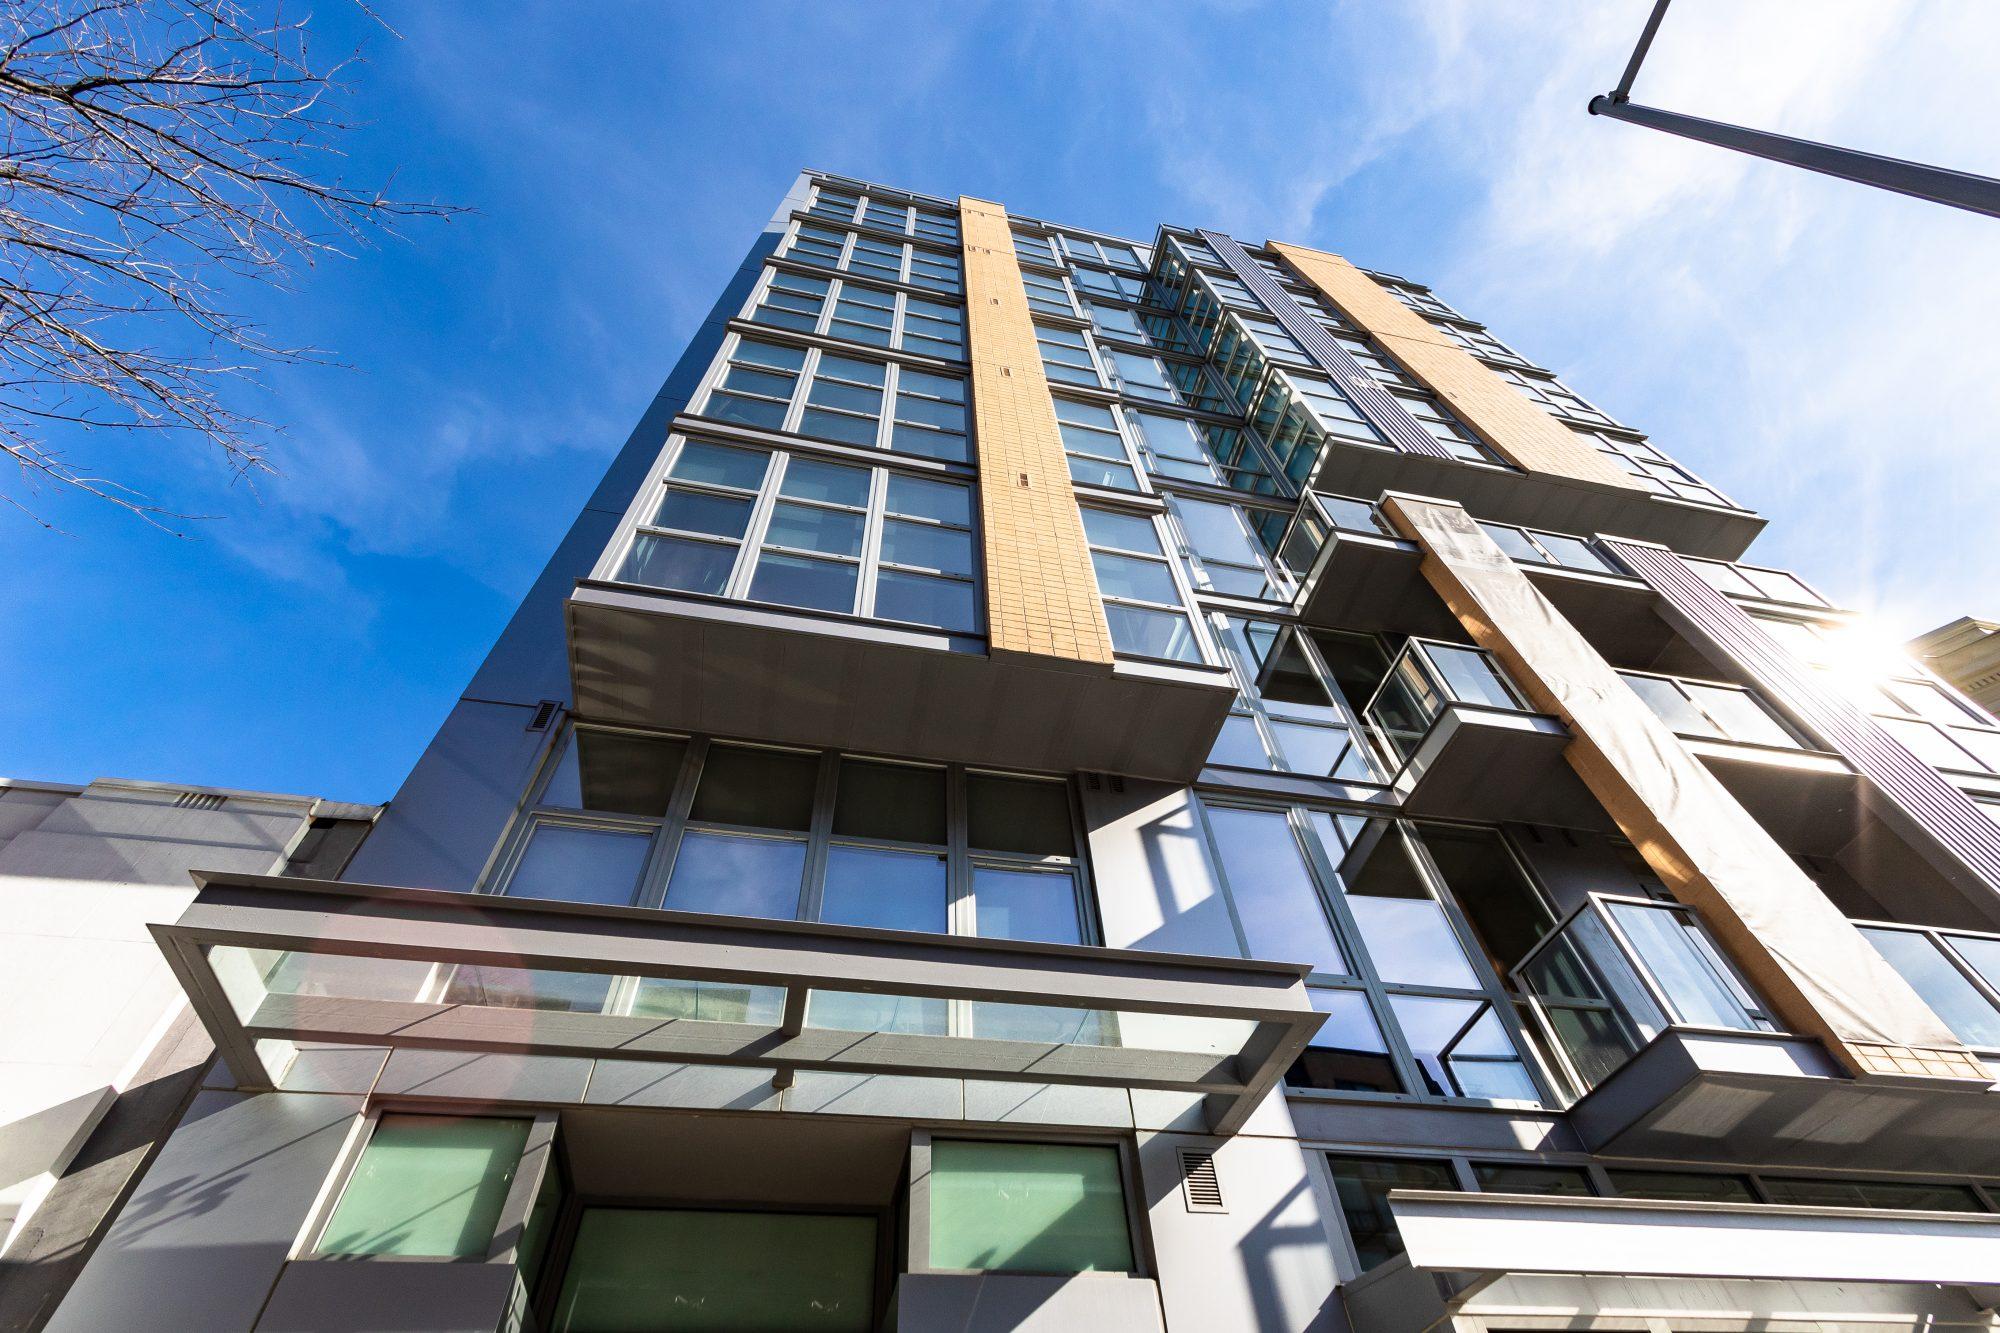 Elysium Fourteen with INTUS Arcade steel reinforced triple pane polymer windows & balcony doors